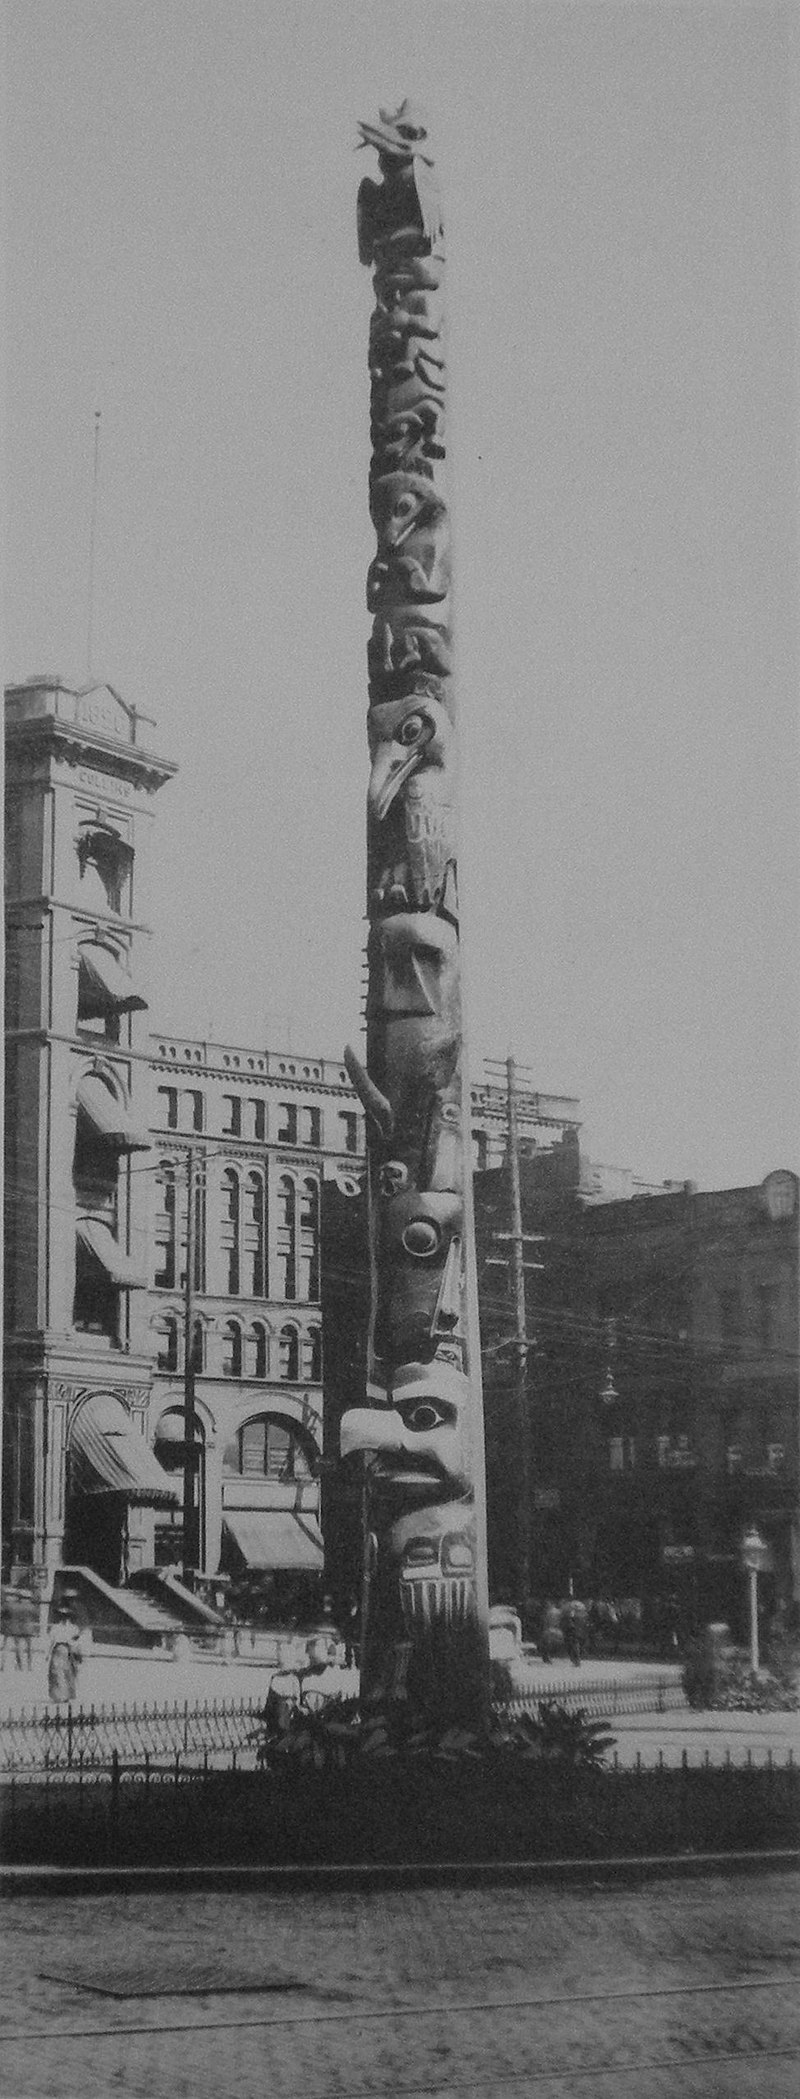 Totem Pole - Pioneer Square - 1907.jpg